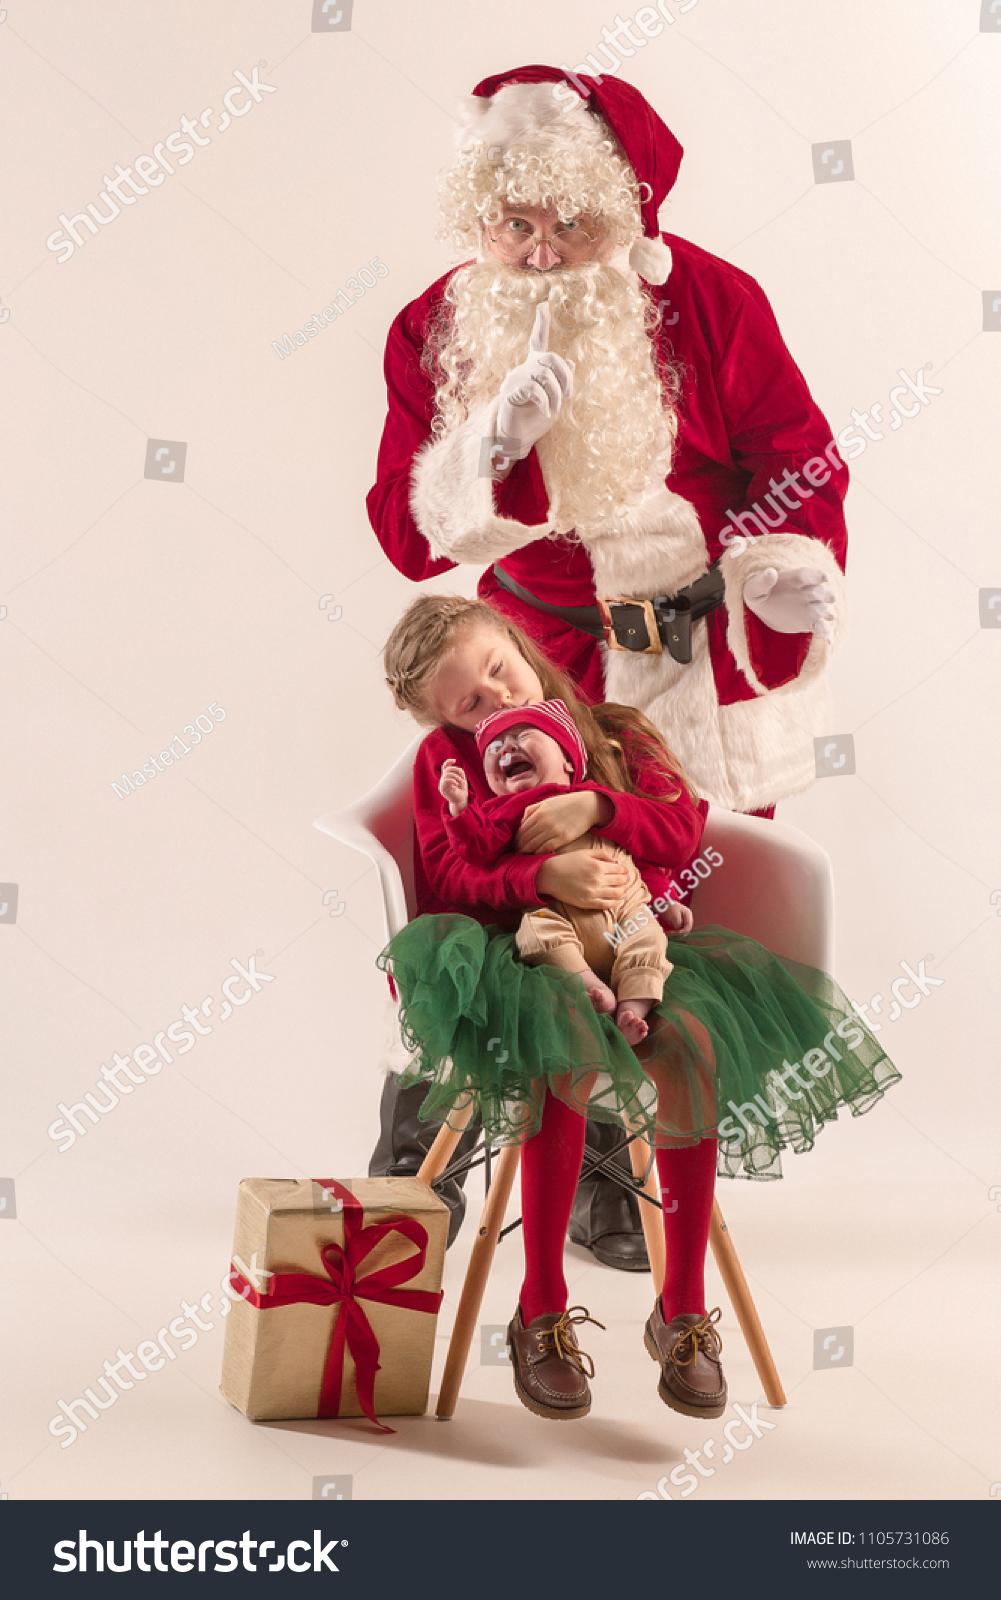 6f1dfb667fc9 Christmas Portrait Cute Little Newborn Baby Stock Photo (Edit Now ...